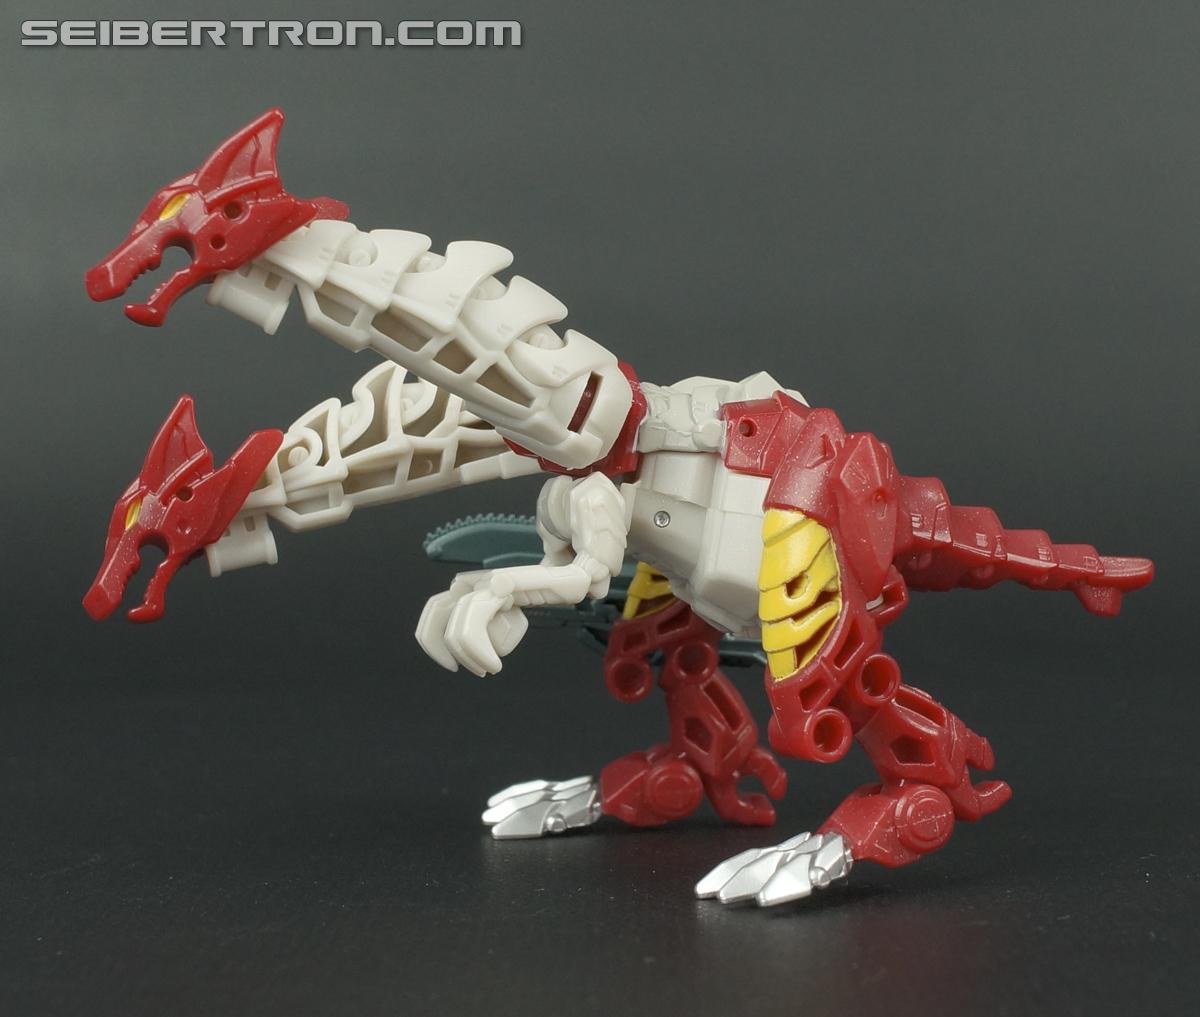 Transformers Prime Beast Hunters Cyberverse Hun-Gurrr (Image #23 of 115)